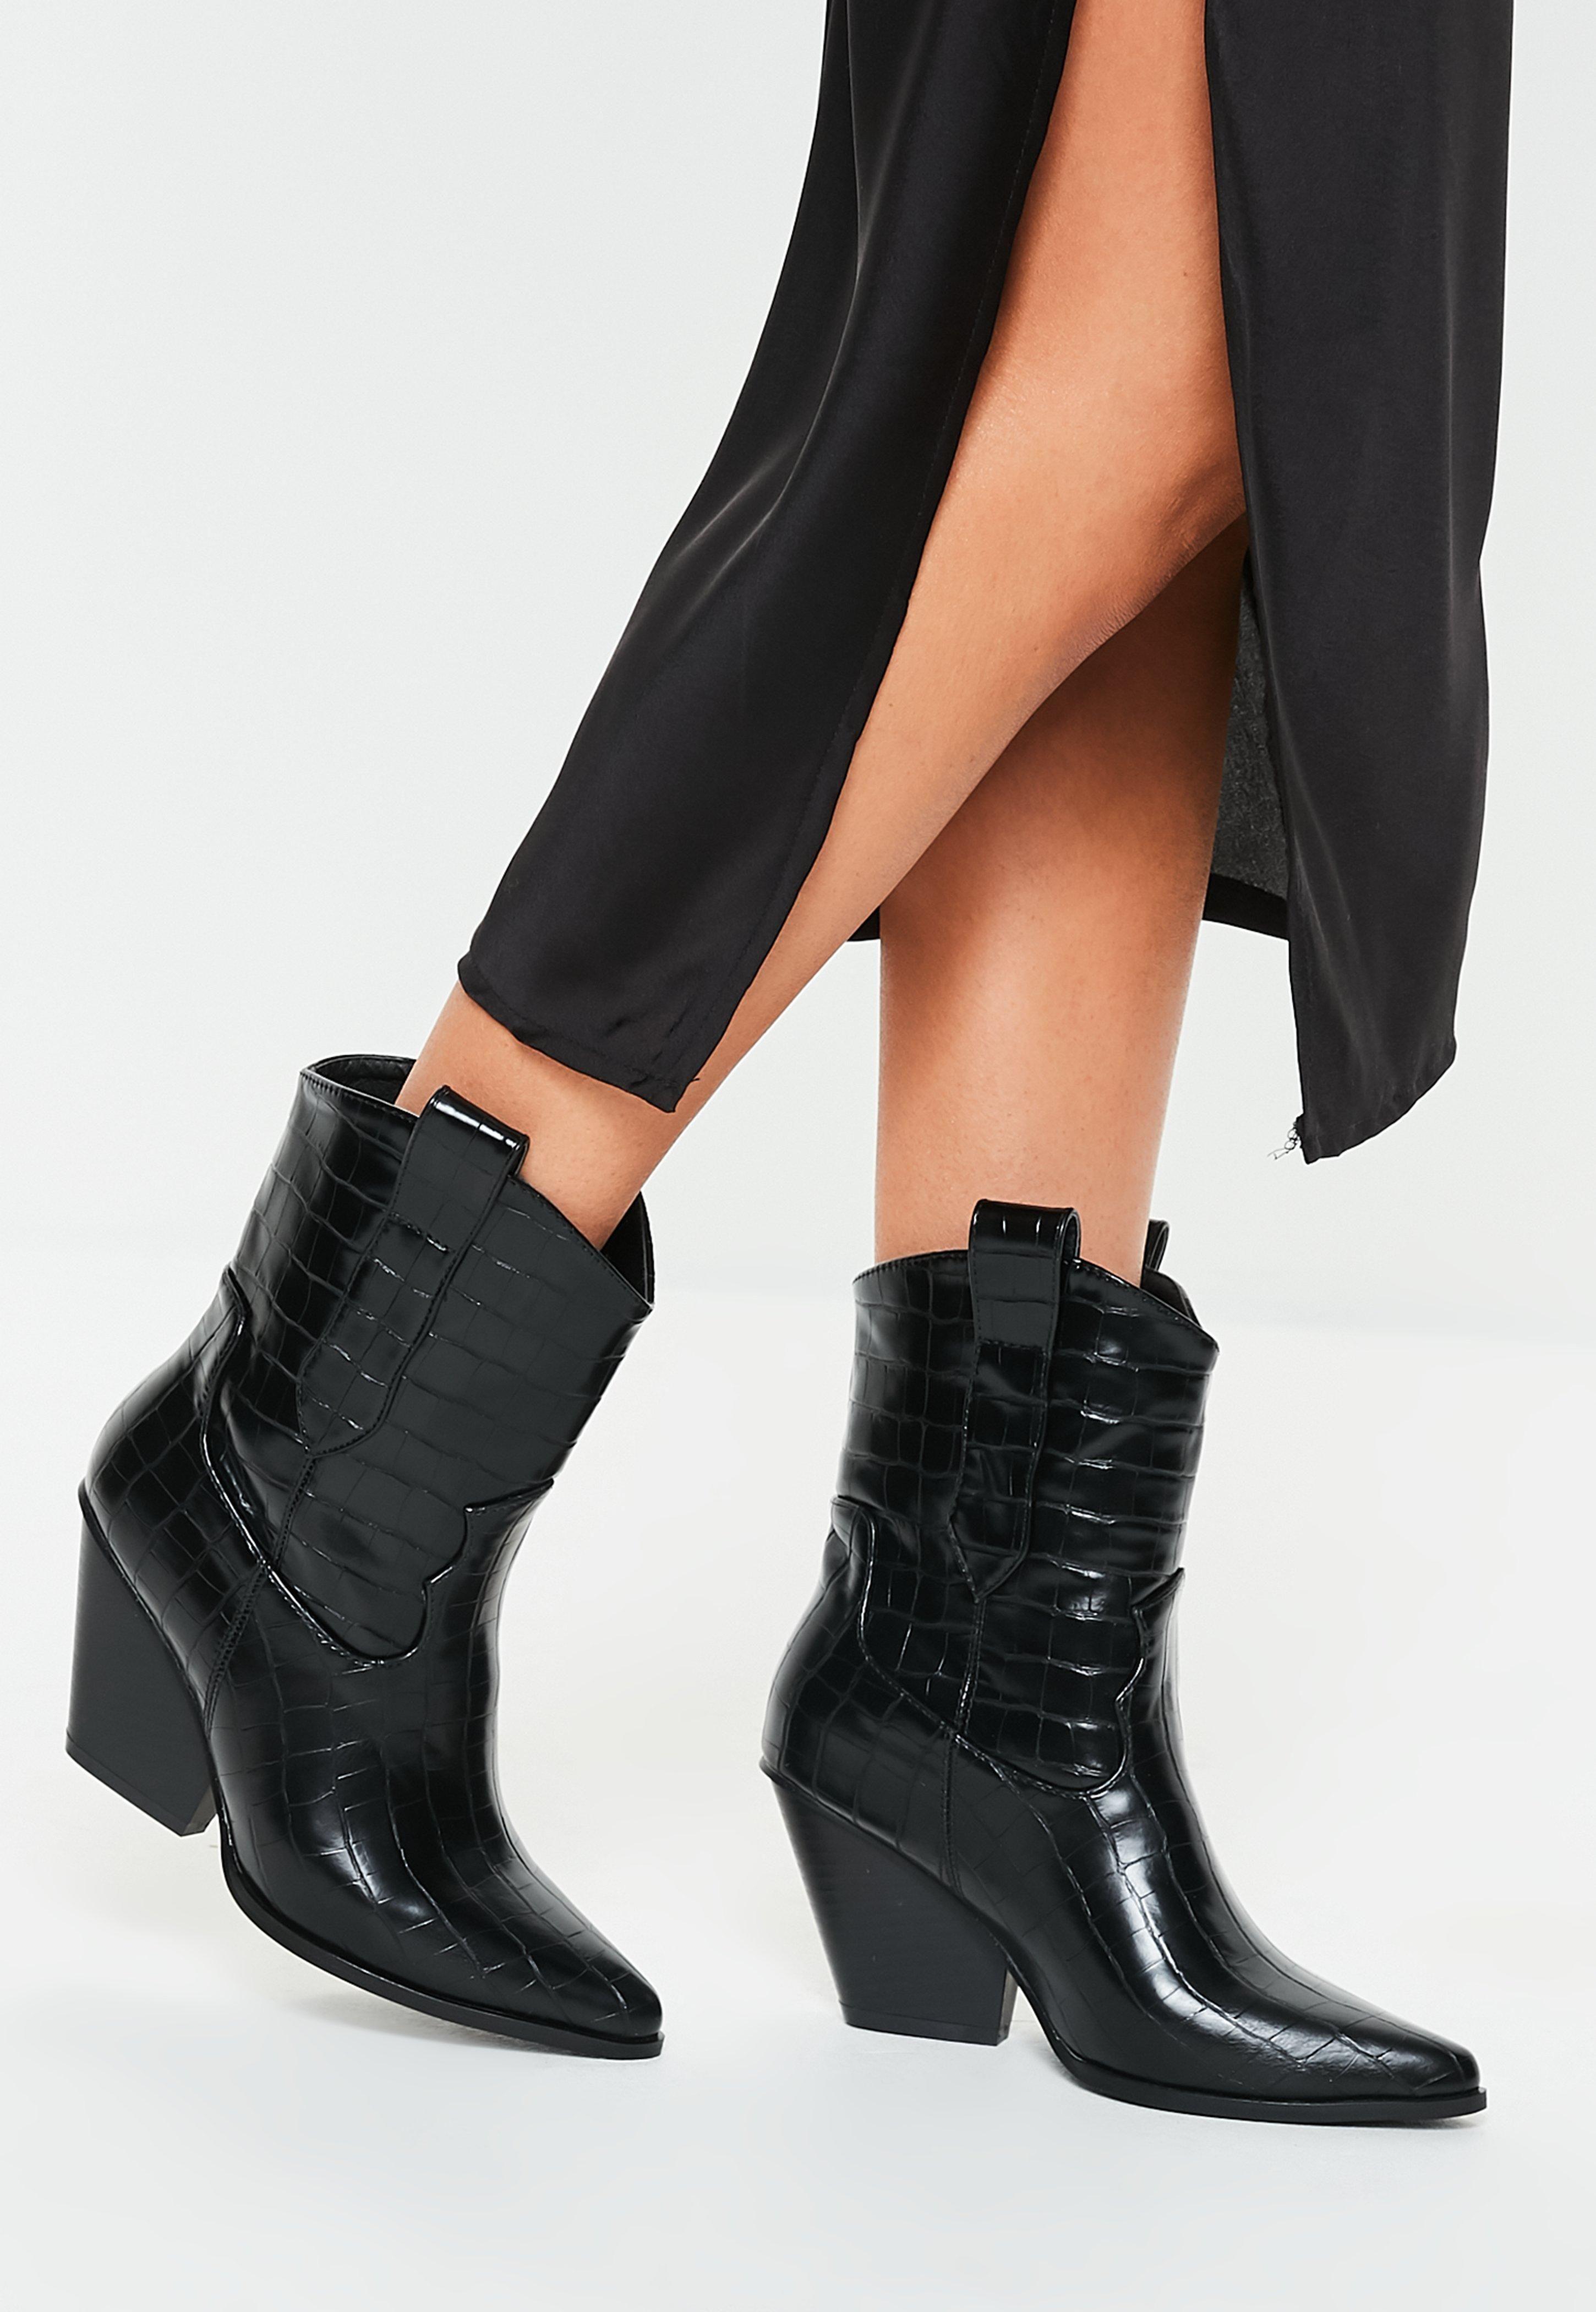 Black Patent Croc Curved Heel Cowboy